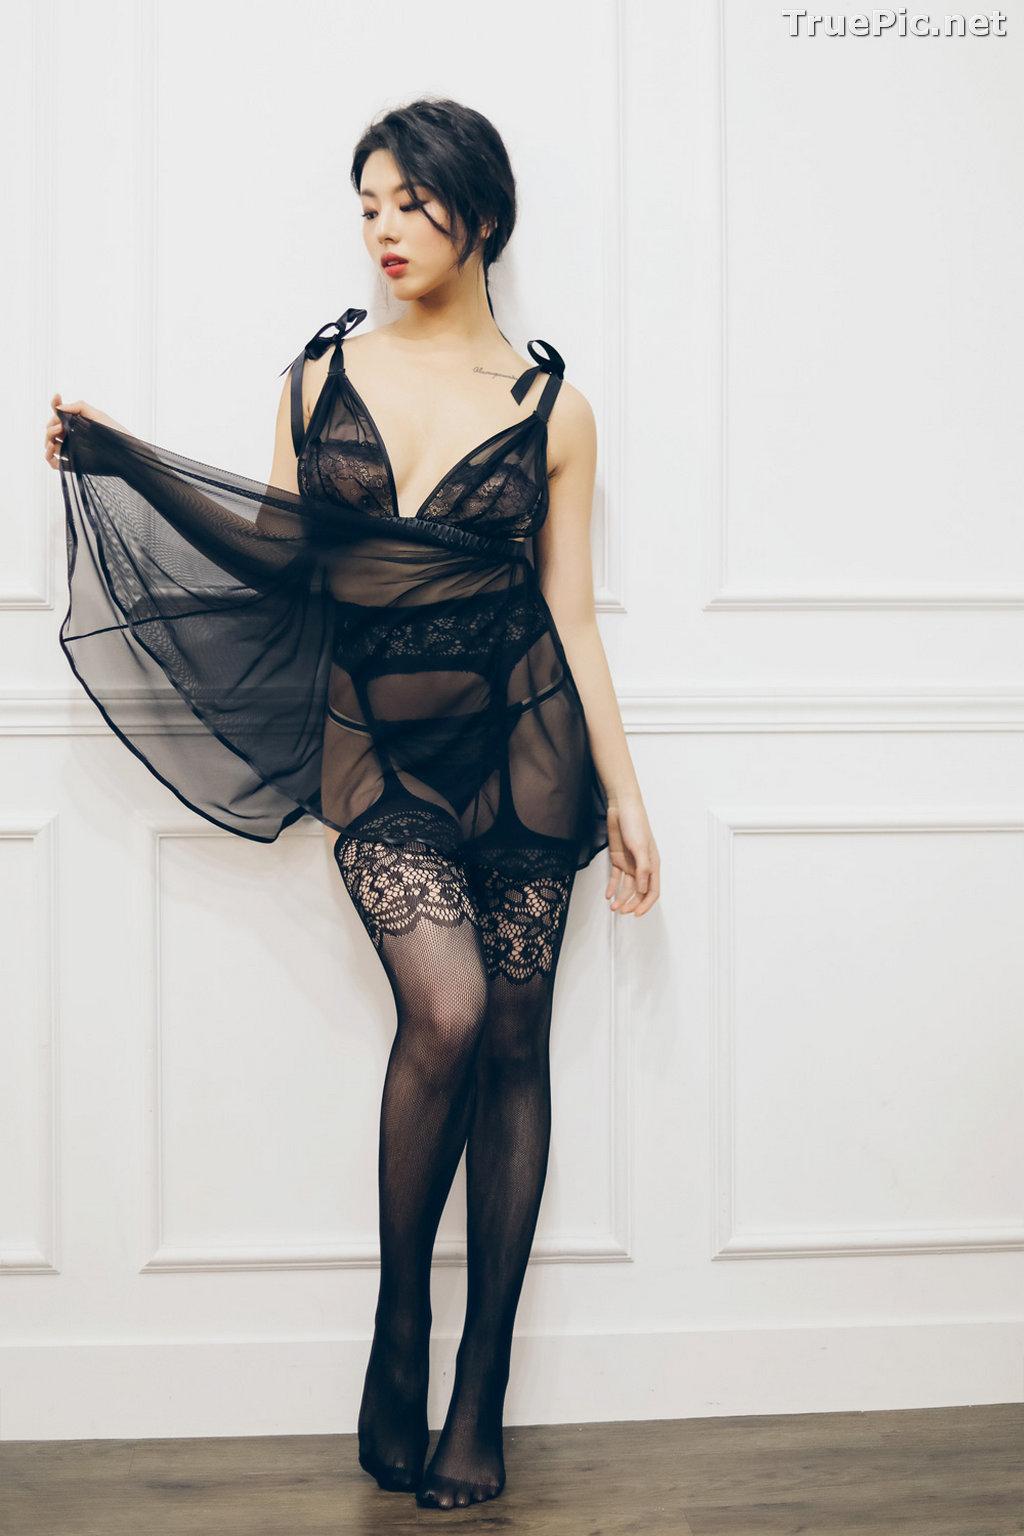 Image Jung Yuna - Korean Fashion Model - Black Transparent Lingerie Set - TruePic.net - Picture-10